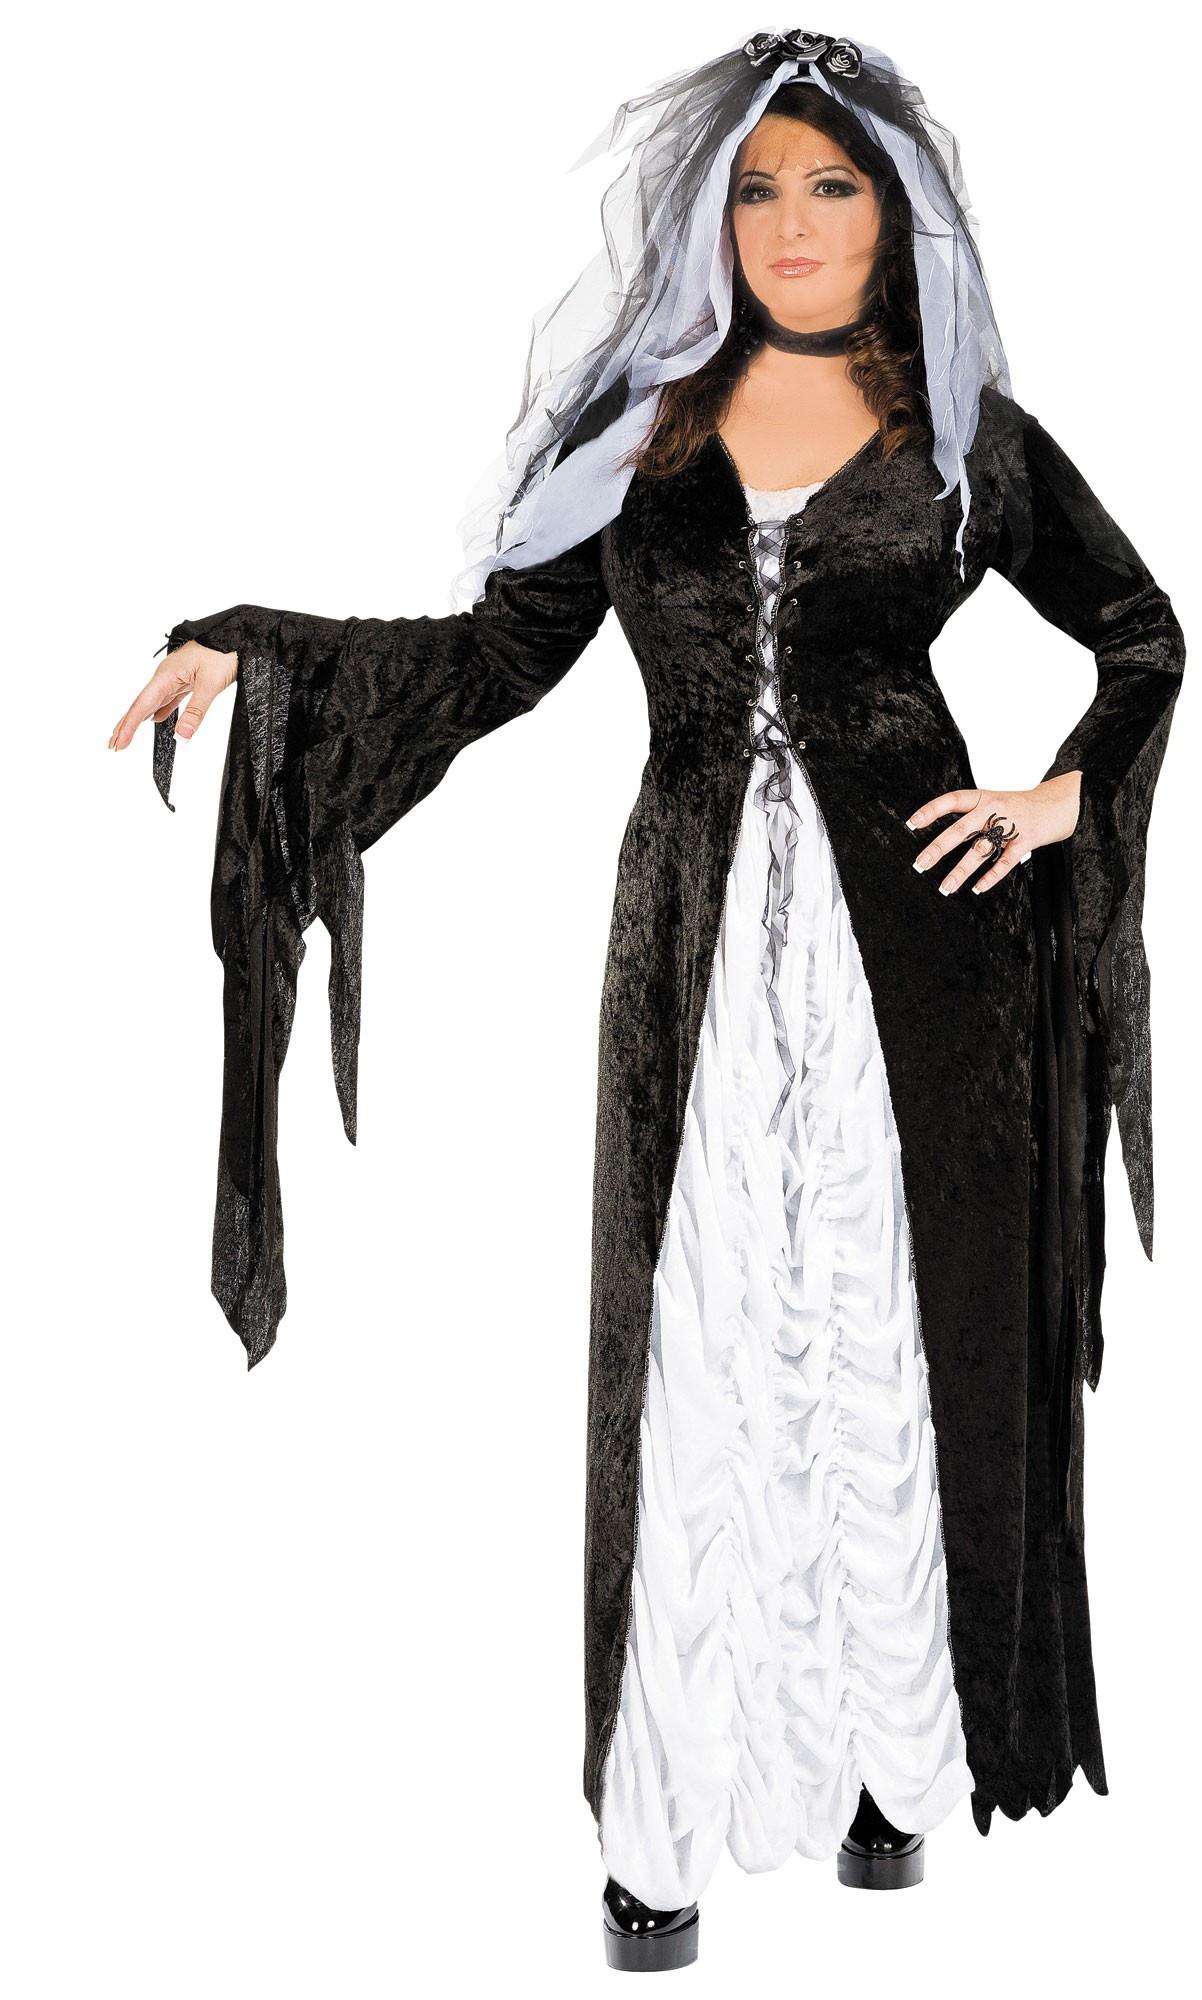 Living Bride of Darkne... Pirate Girl Costume Makeup